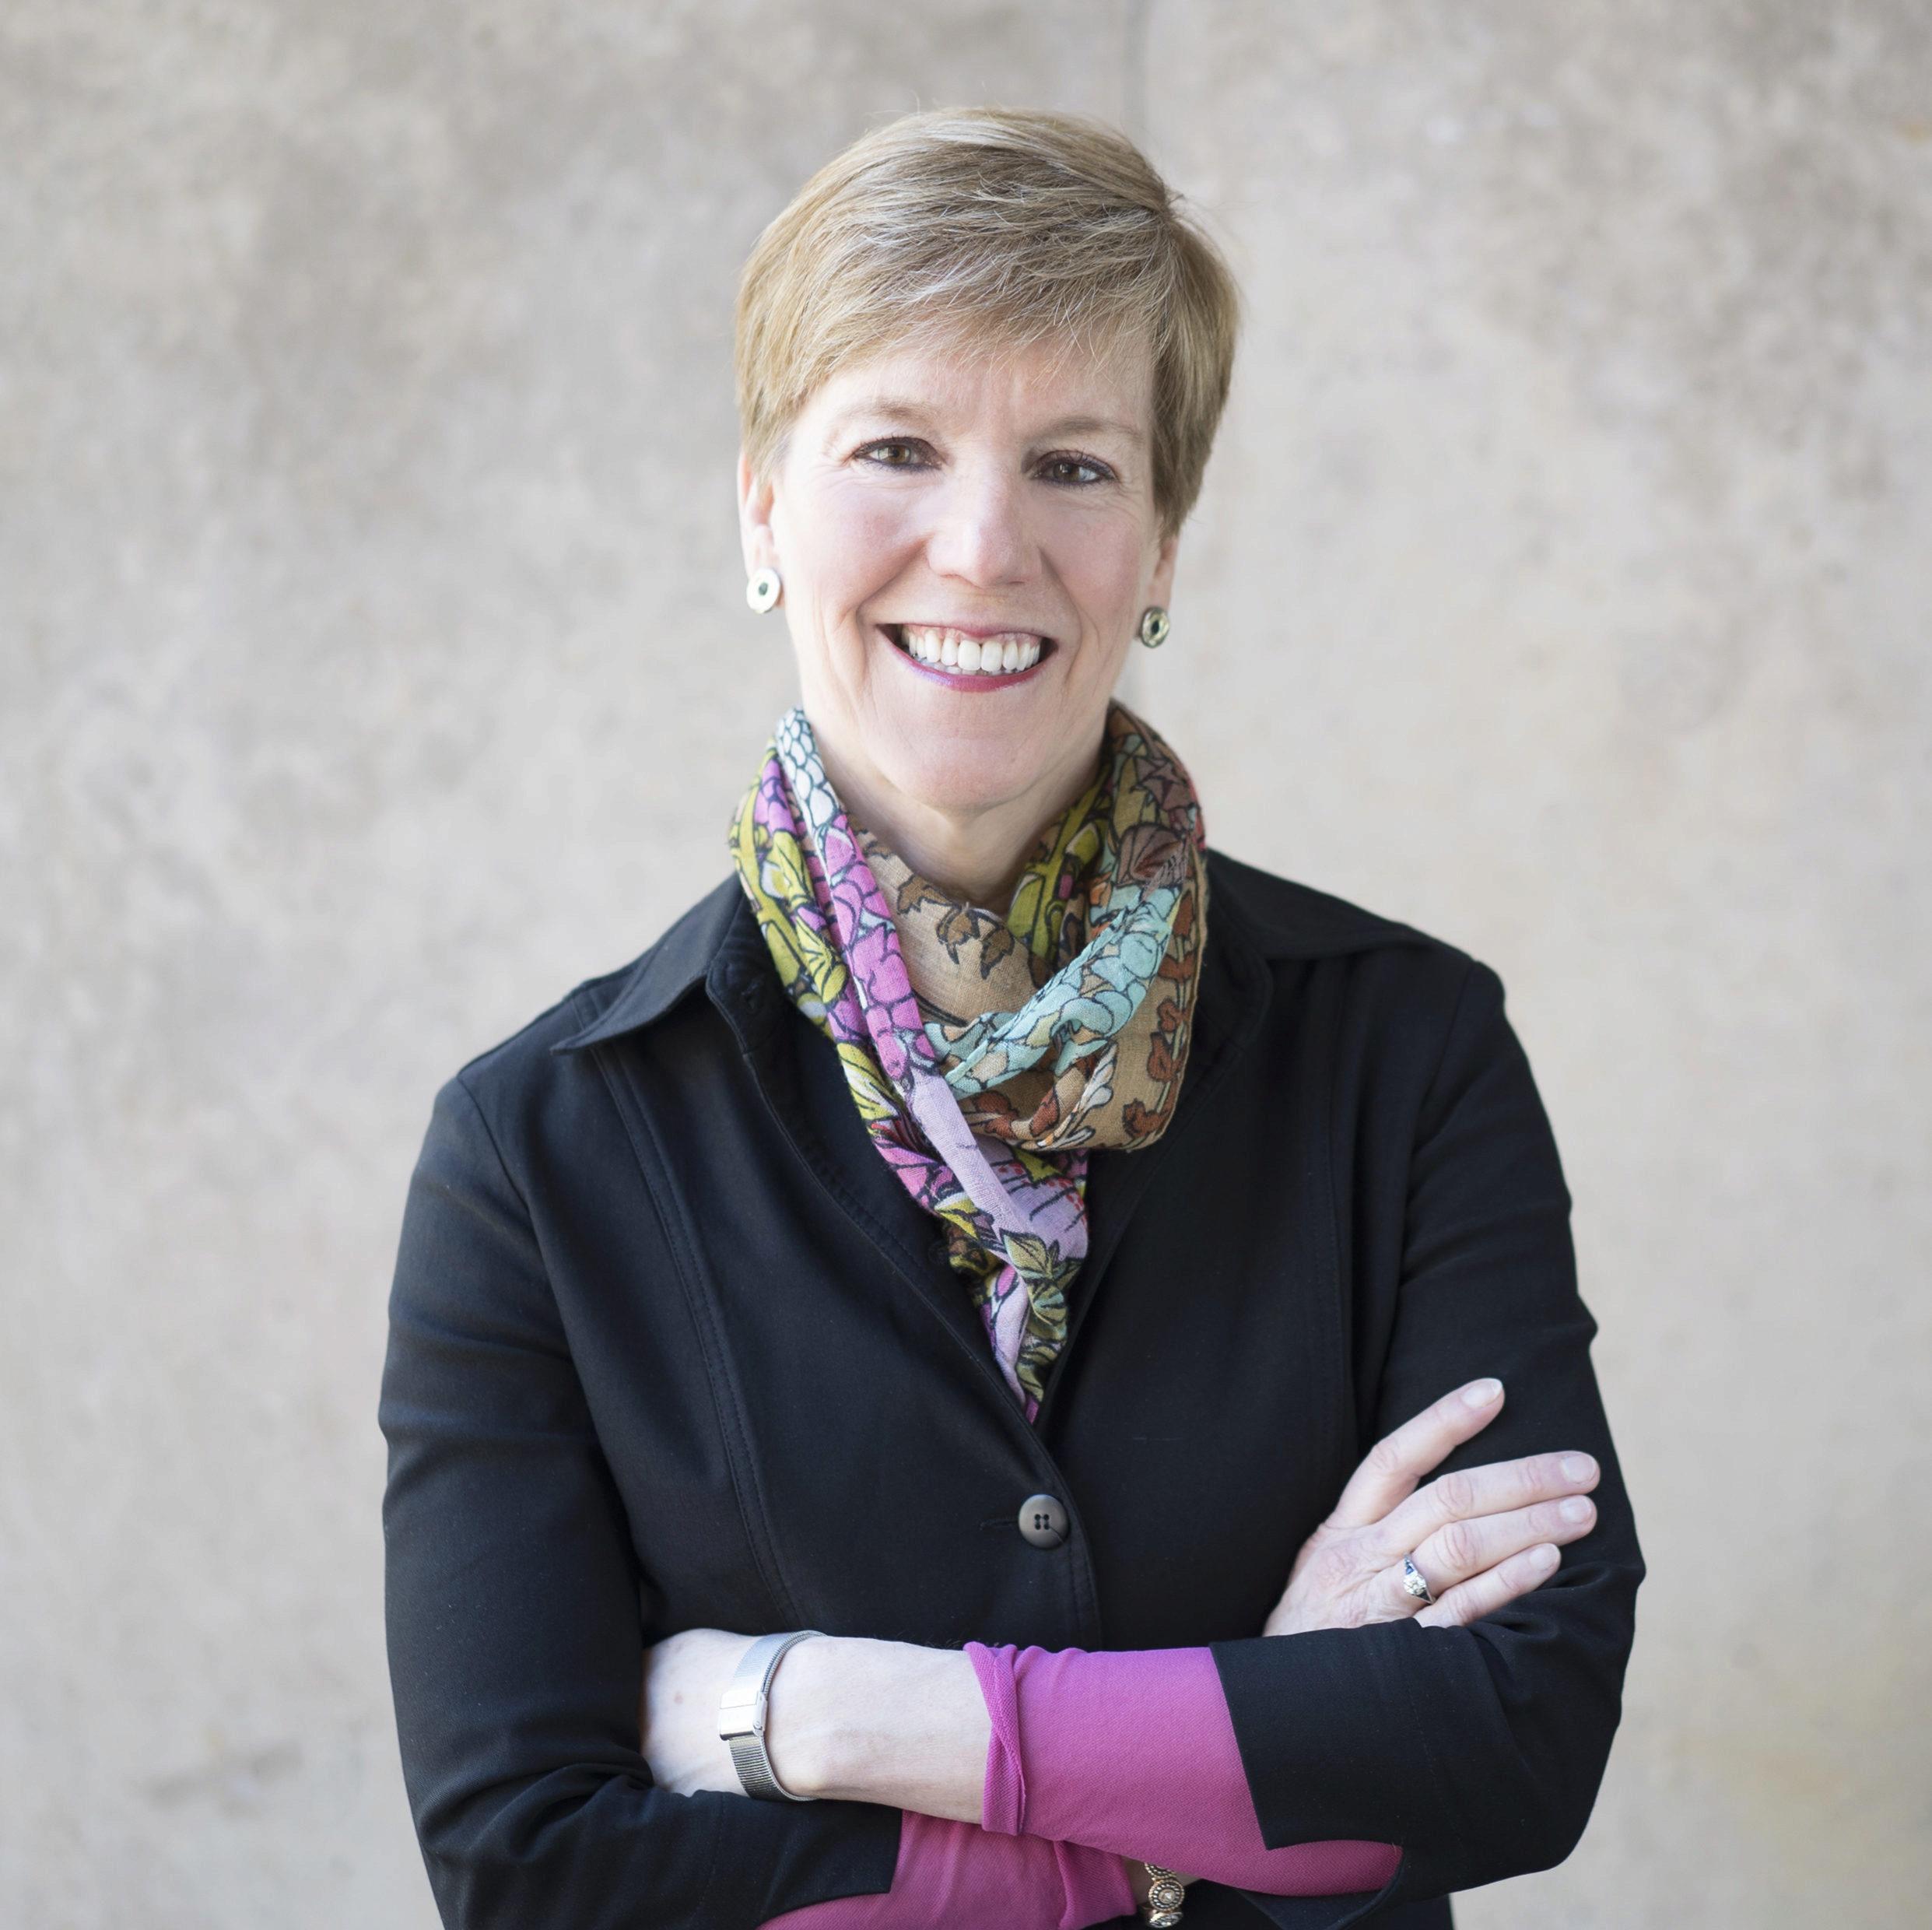 headshot of Vice Dean Katherine Klein